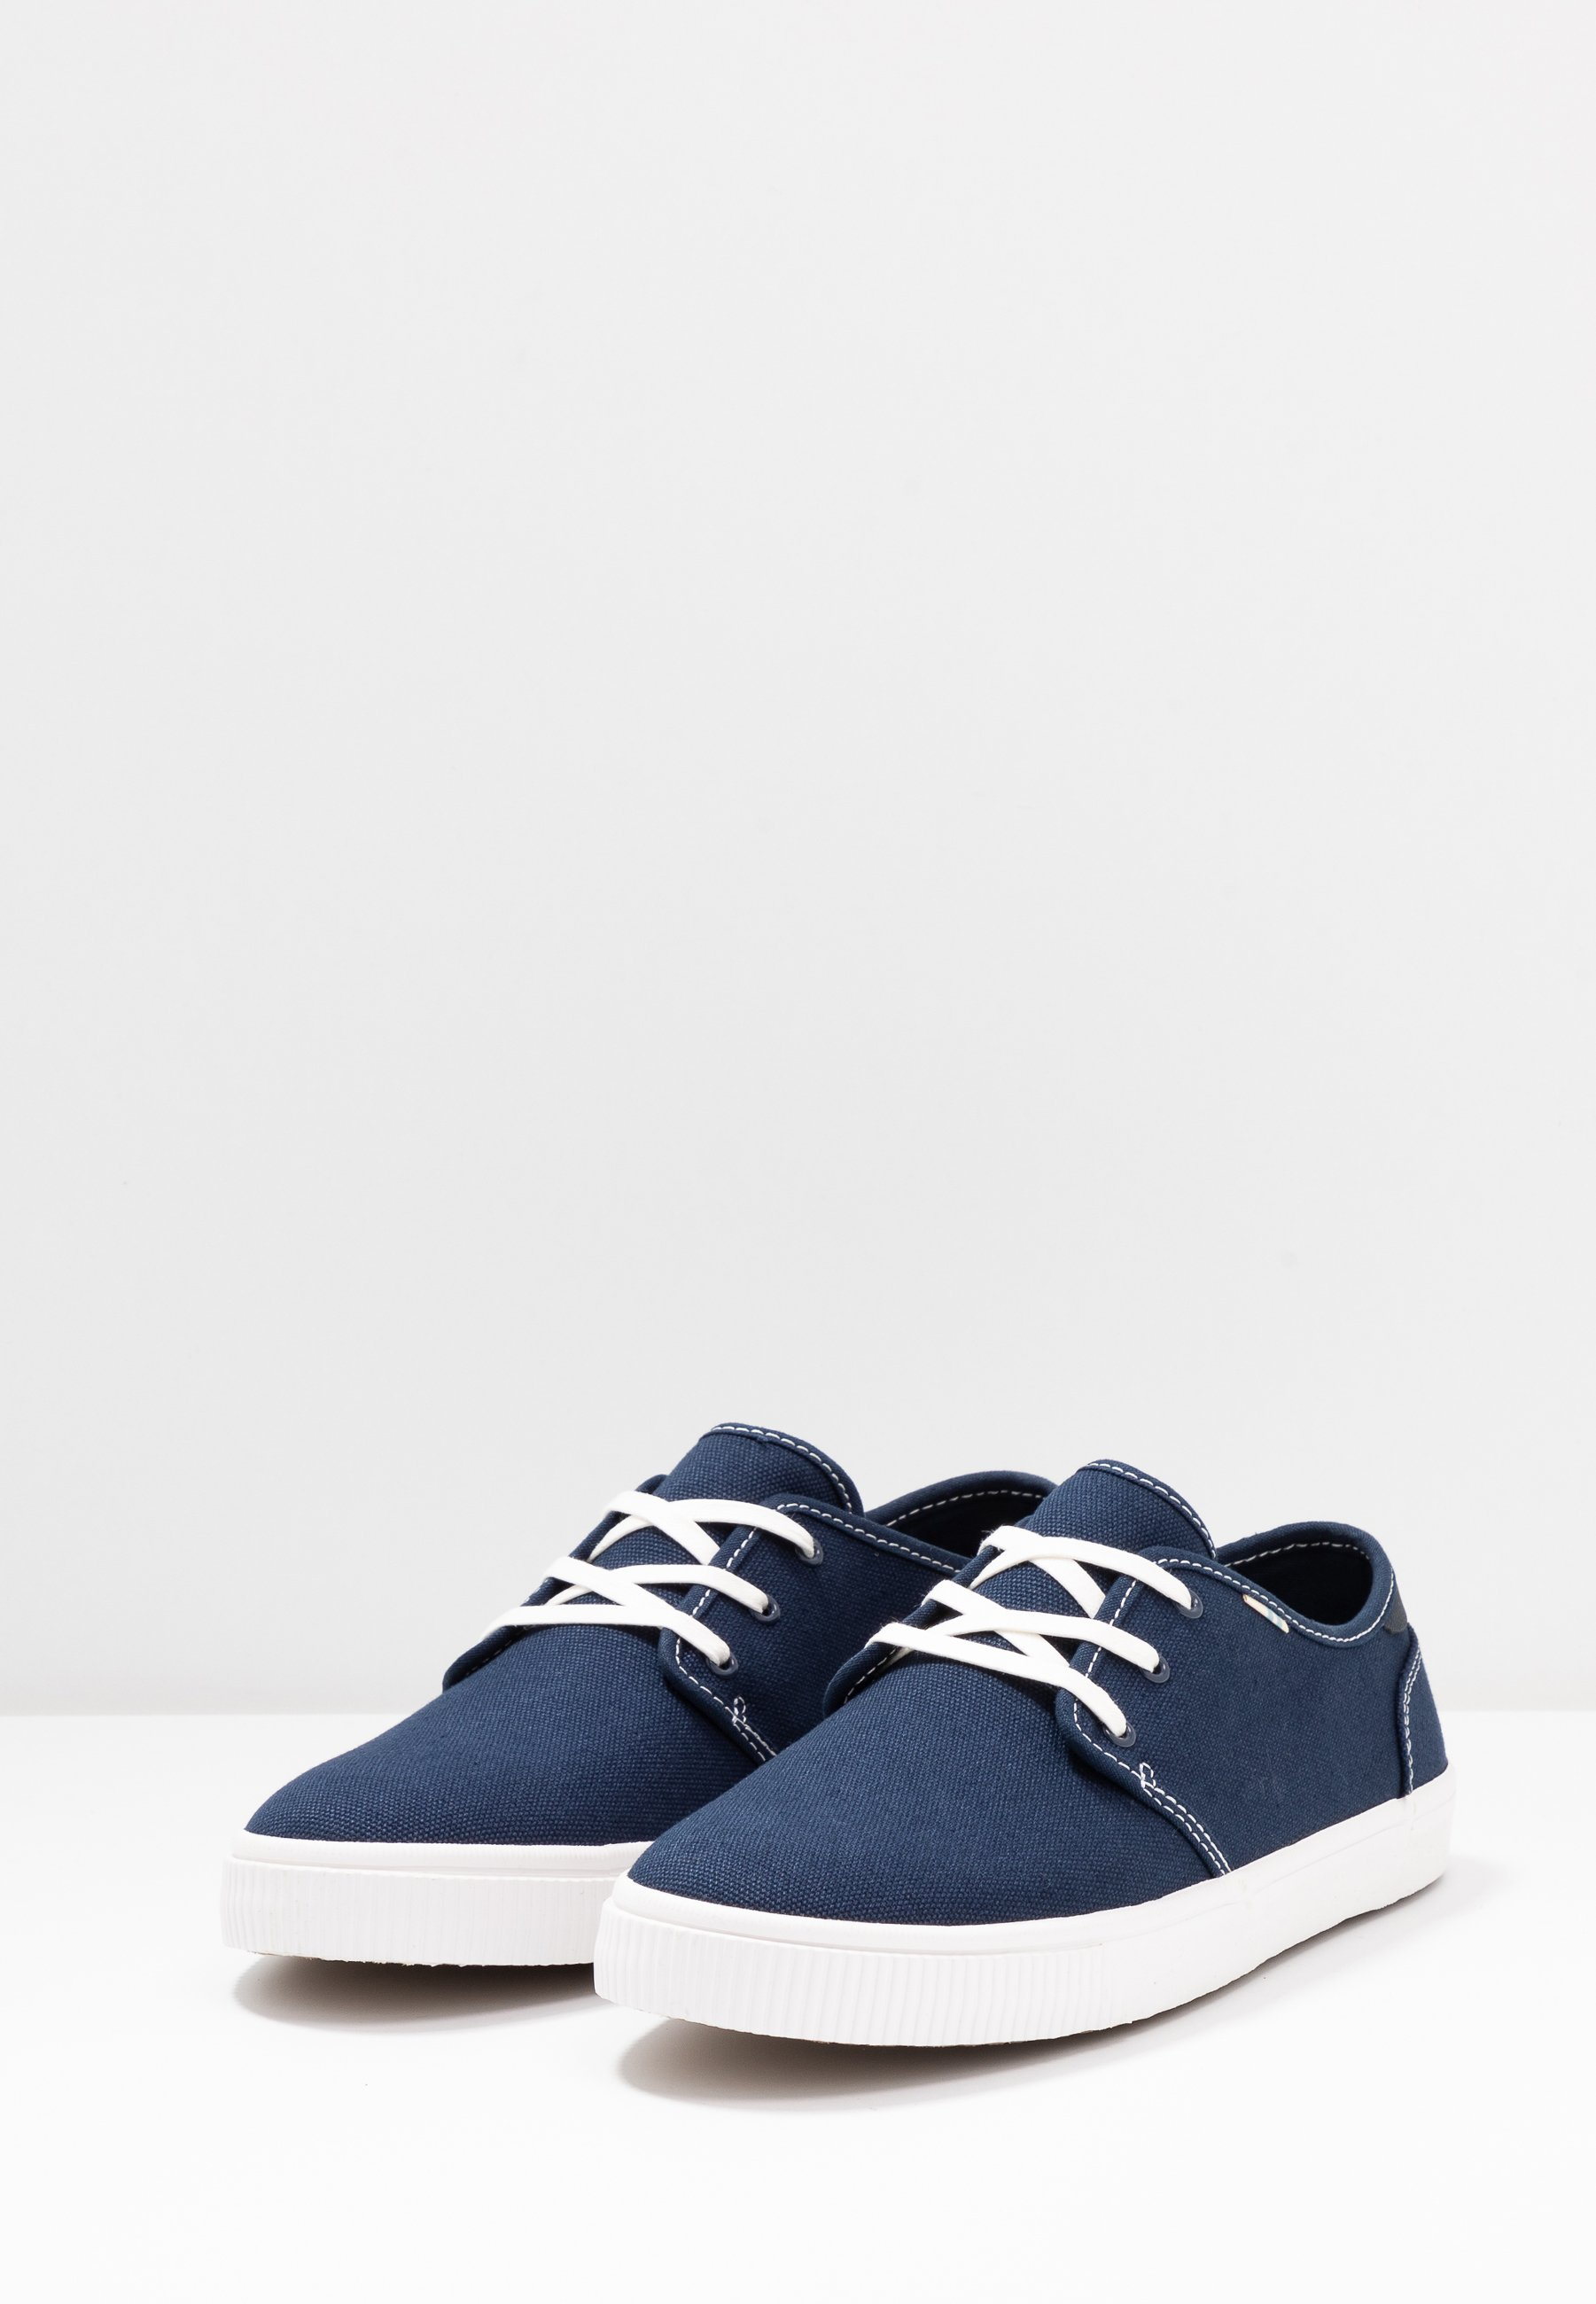 TOMS CARLO - Sneaker low - navy/dunkelblau - Herrenschuhe QGmjX